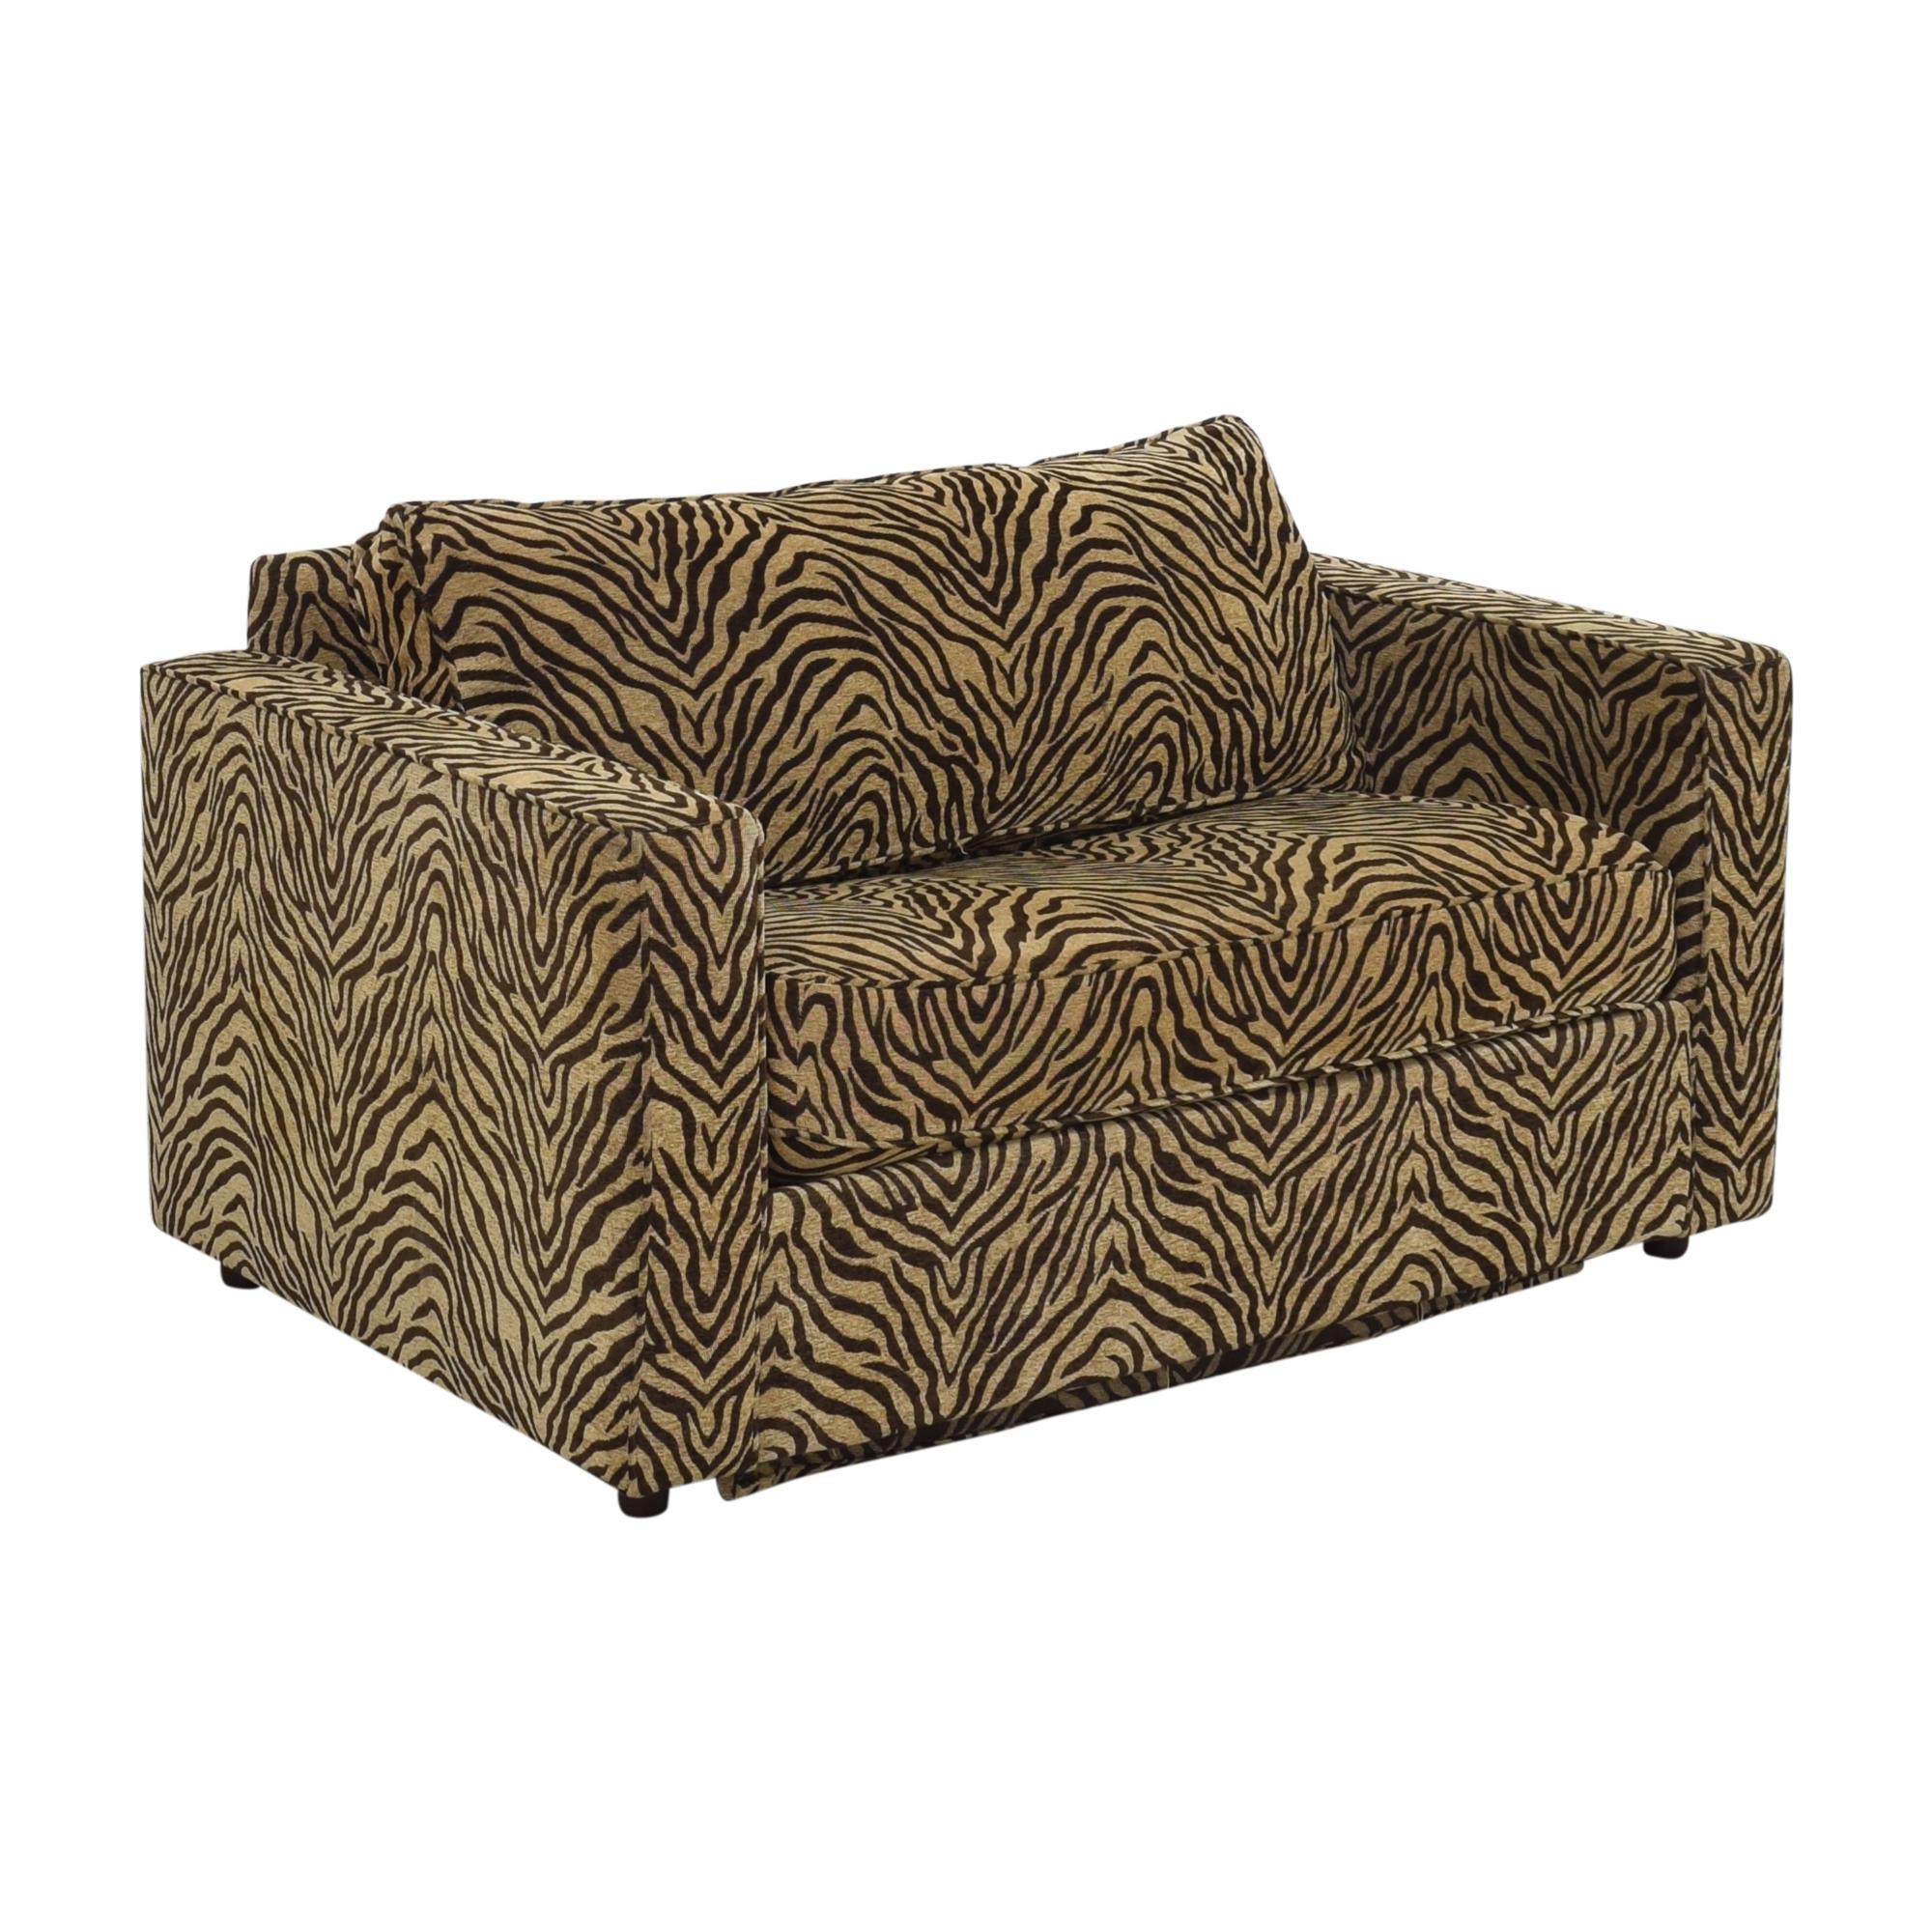 Arhaus Twin Sleeper Chair sale